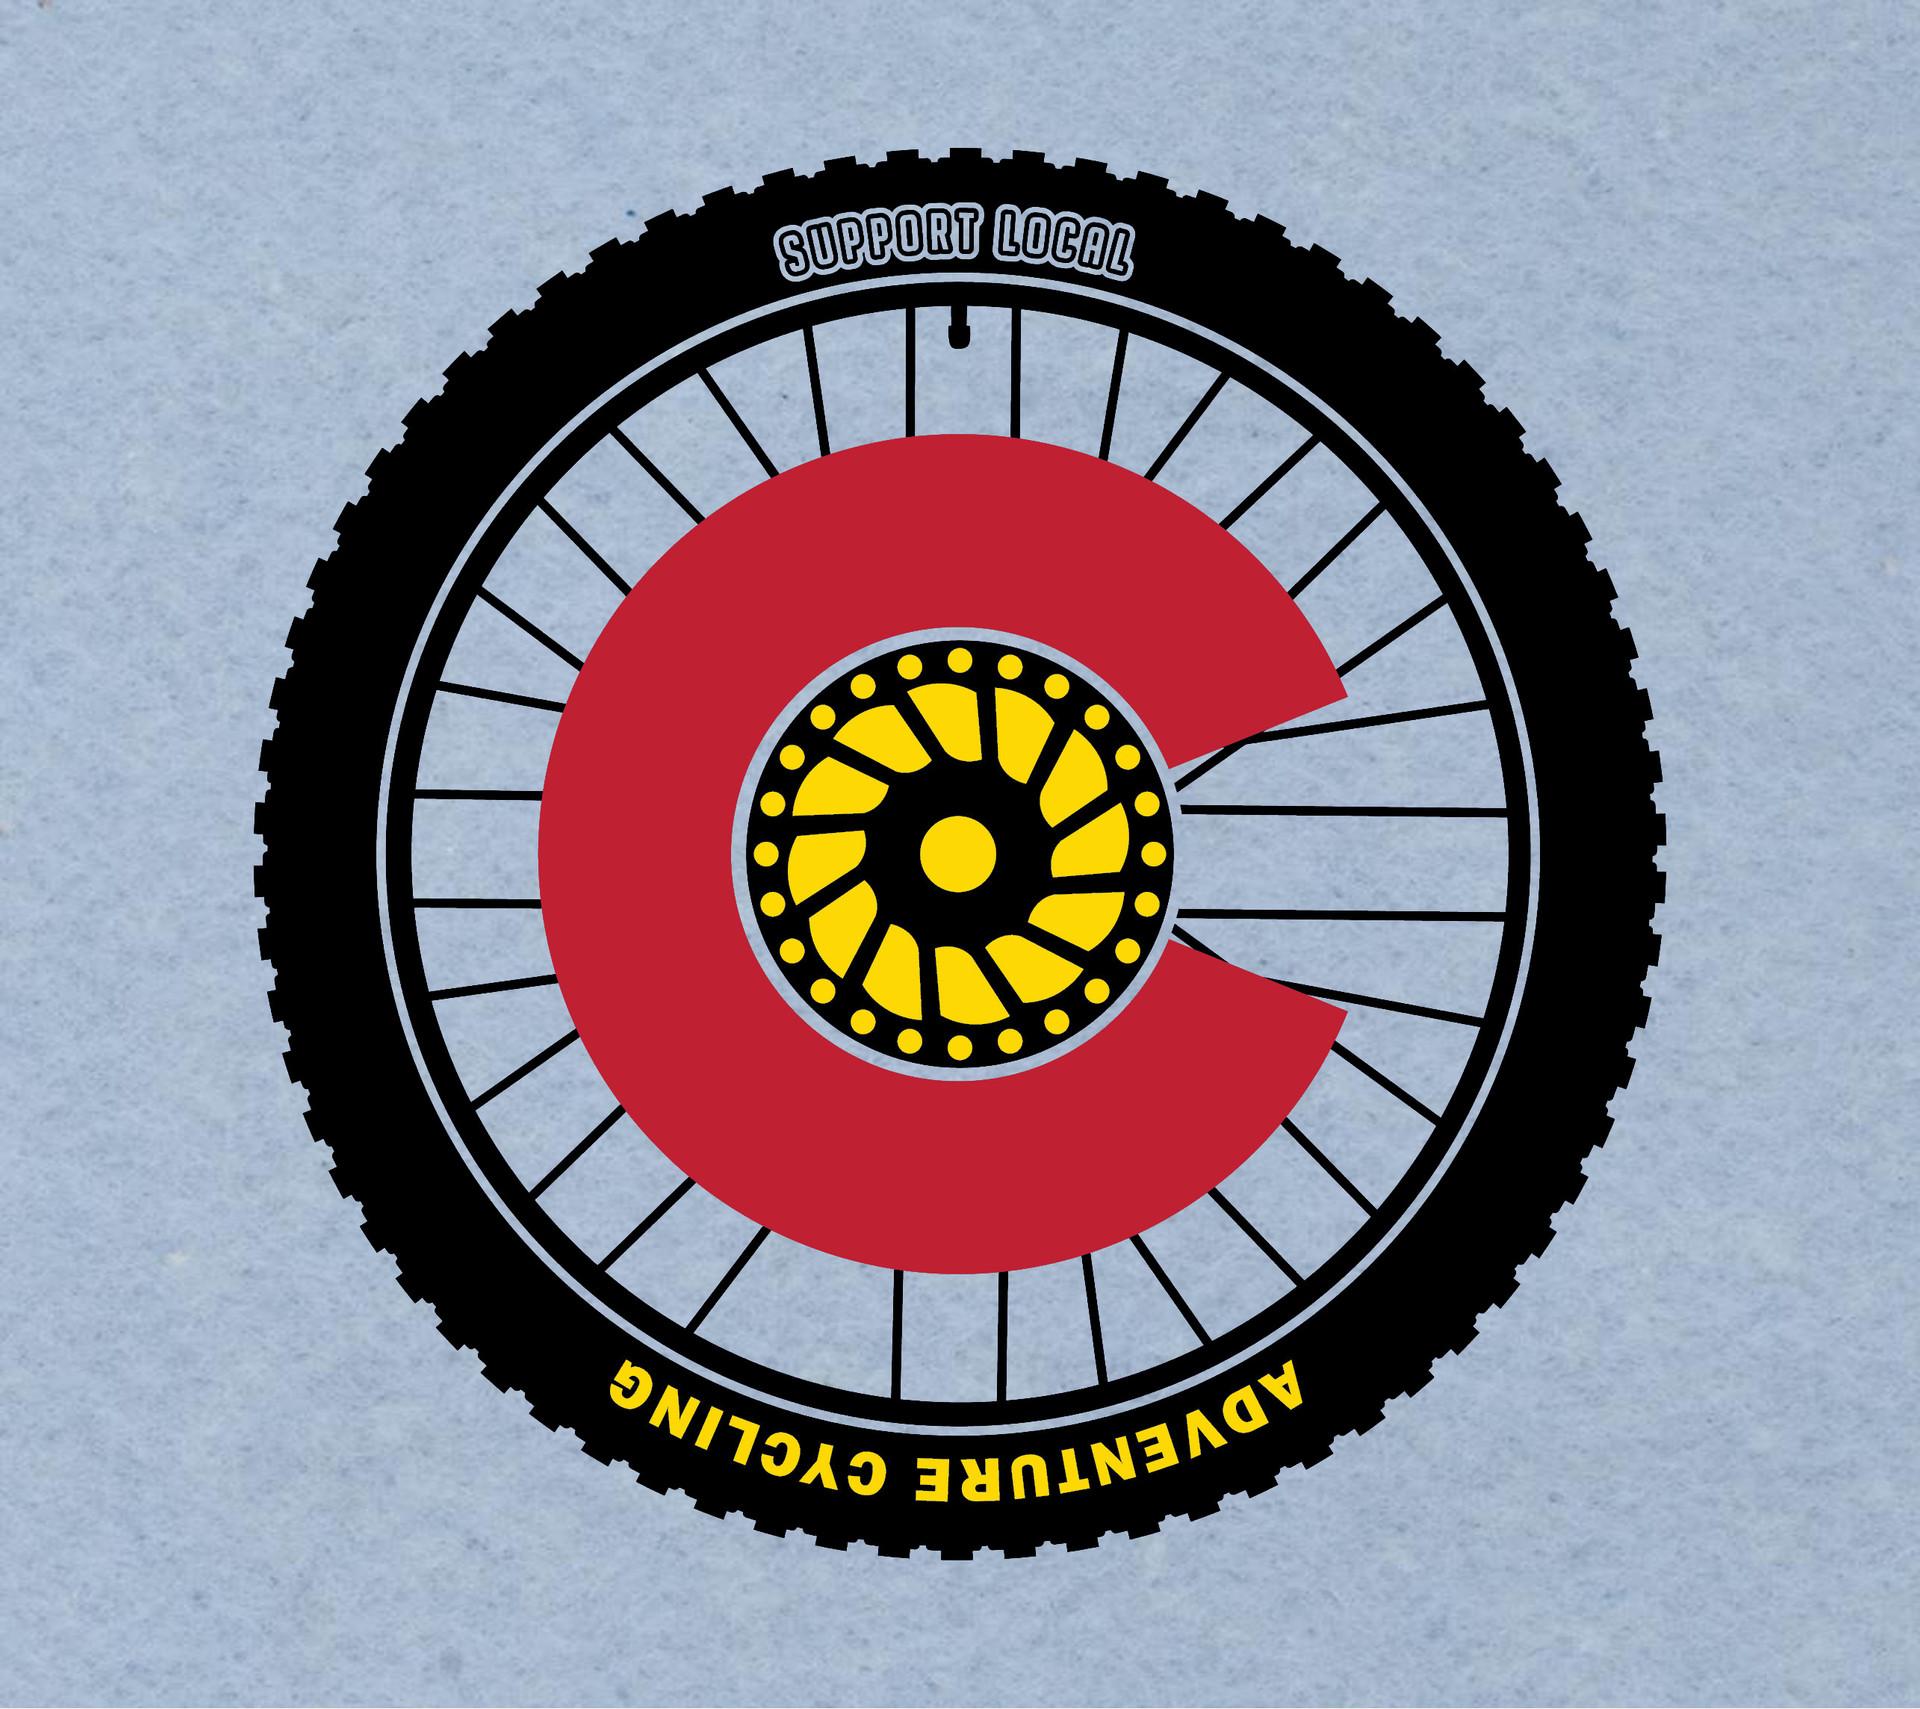 AdventureCyclingMTBCODesign5.jpg